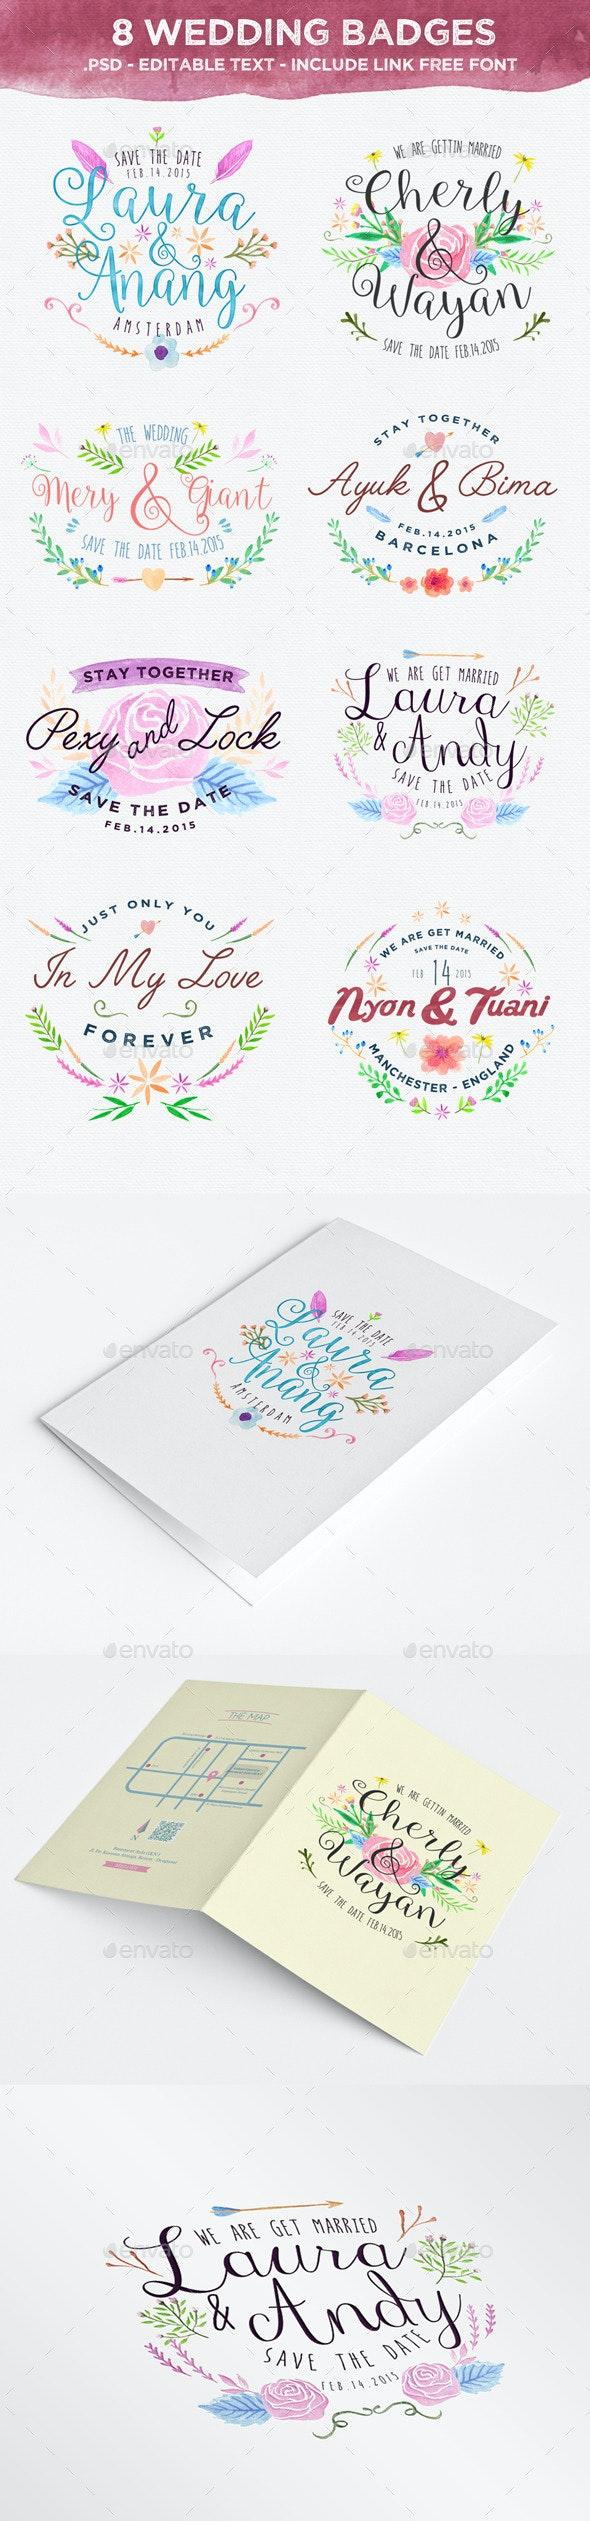 8 Wedding Badges - Badges & Stickers Web Elements